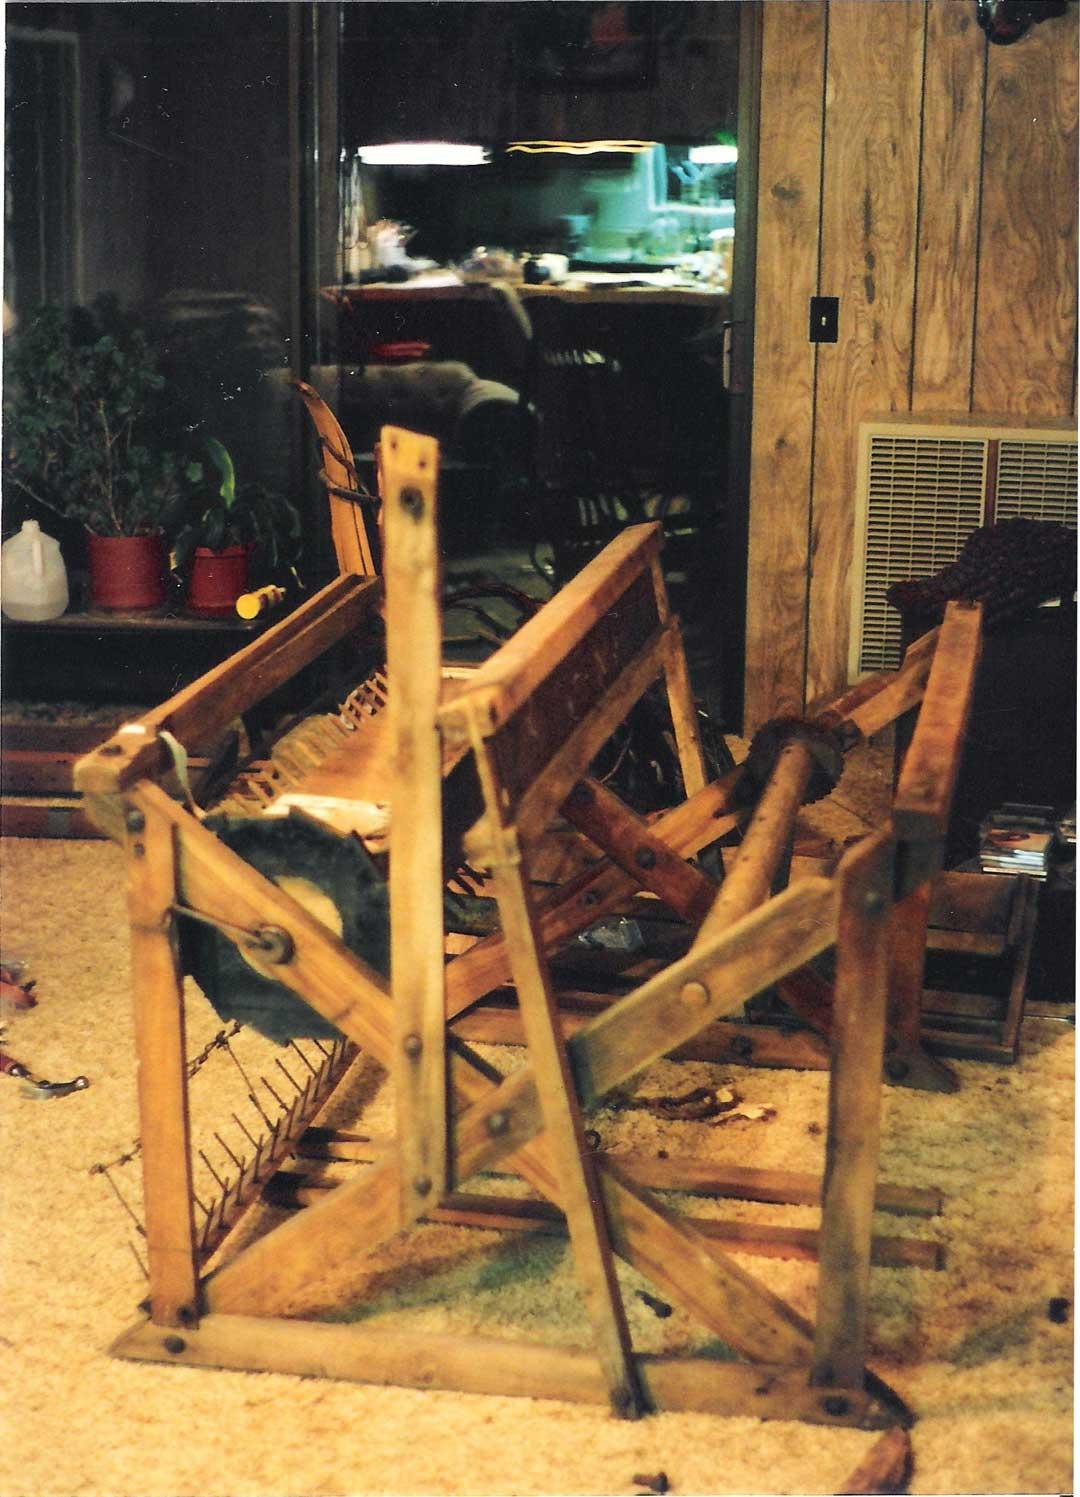 My very first loom: Union Loom — Rebecca Mezoff